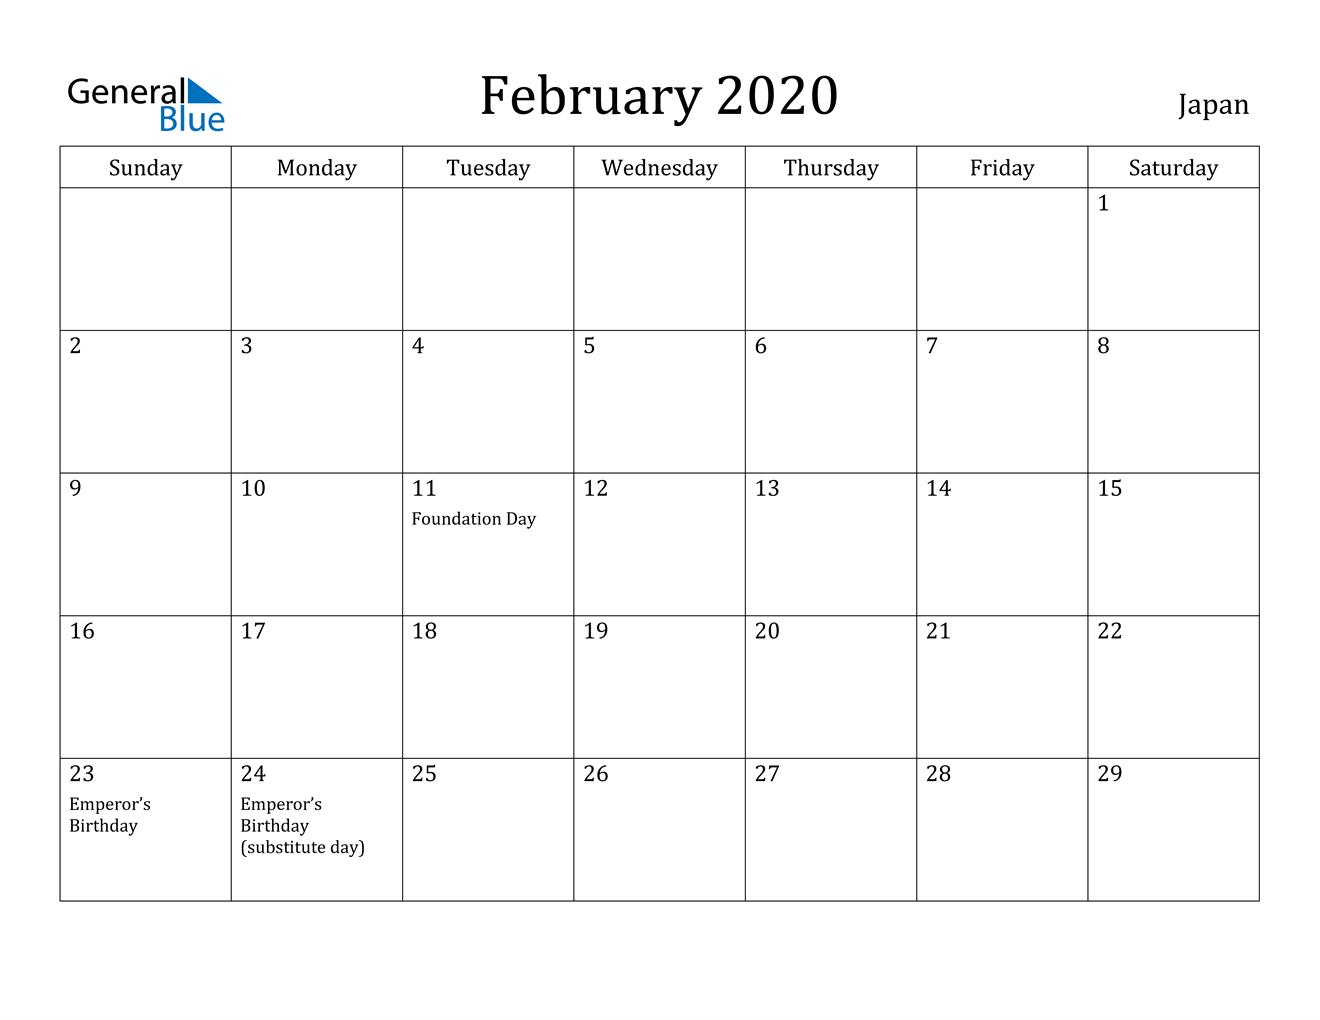 Image of February 2020 Japan Calendar with Holidays Calendar